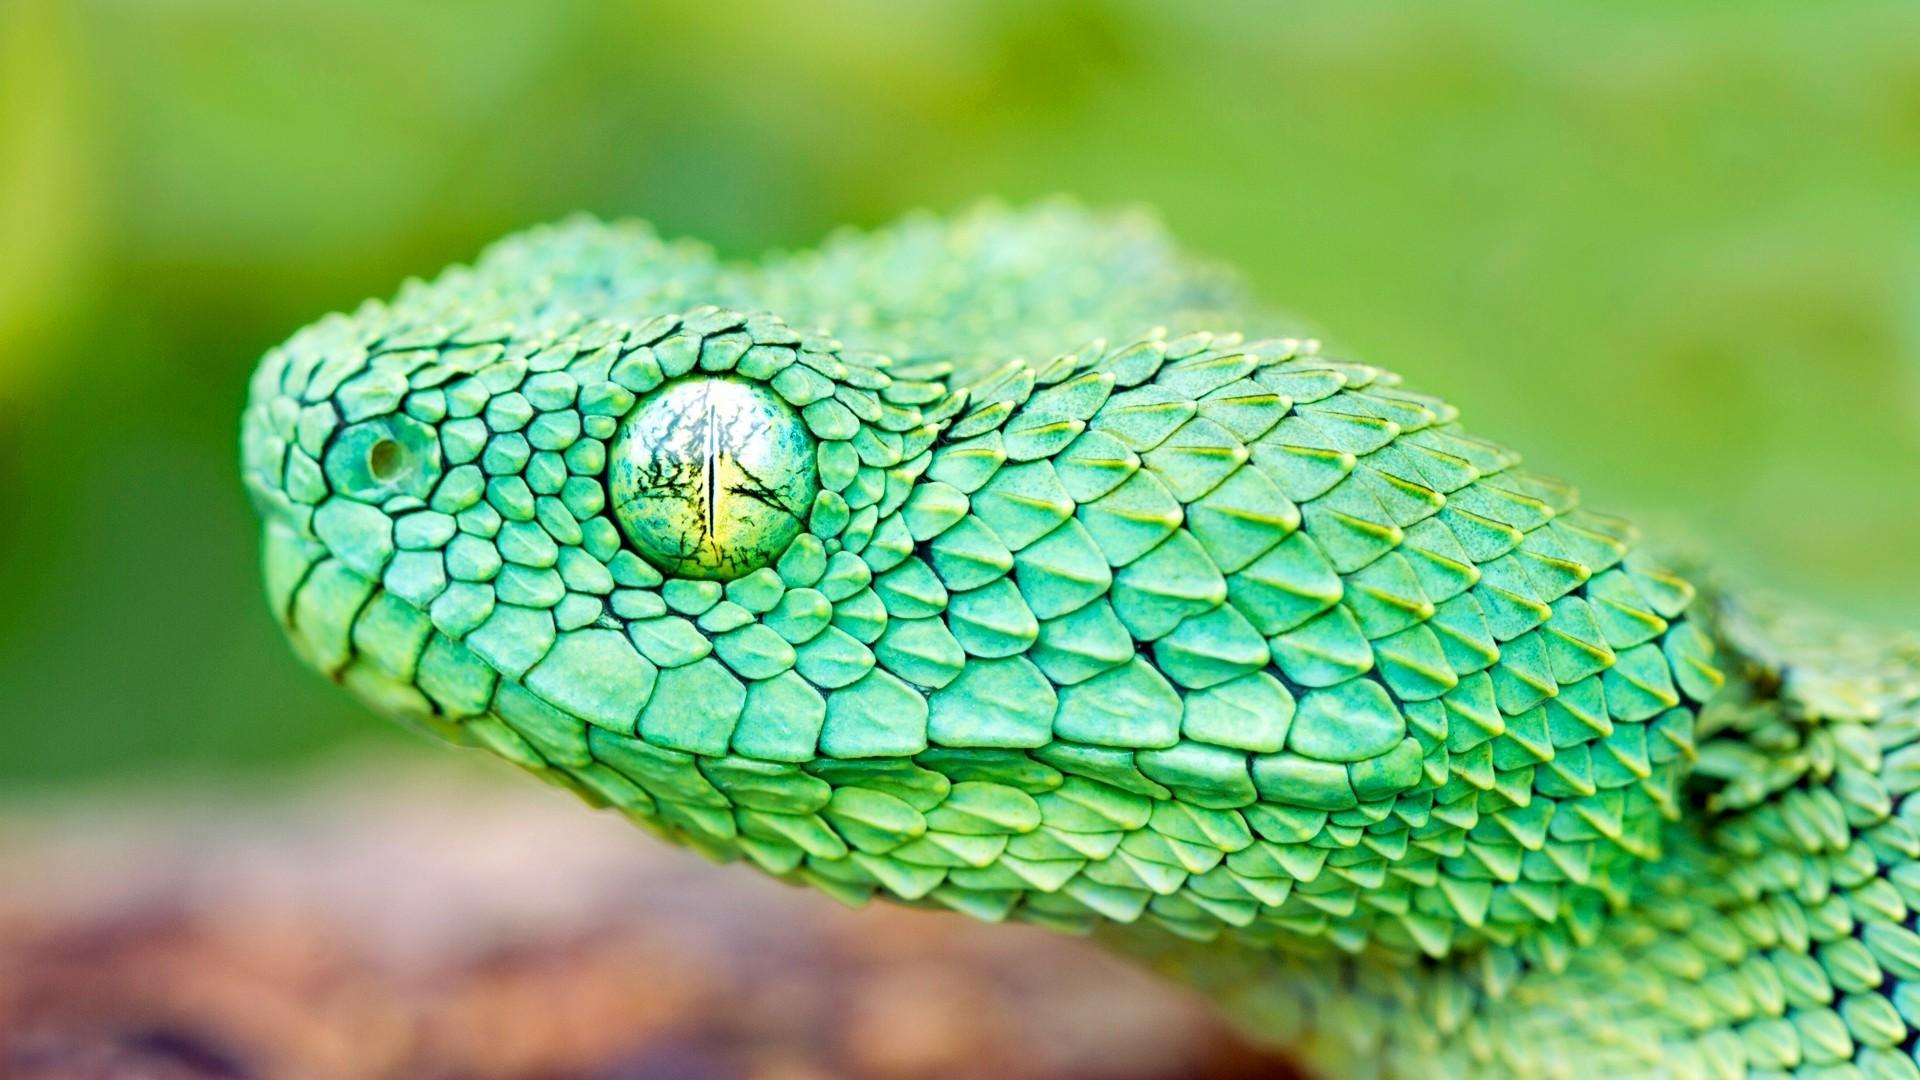 Snake hd wallpaper download